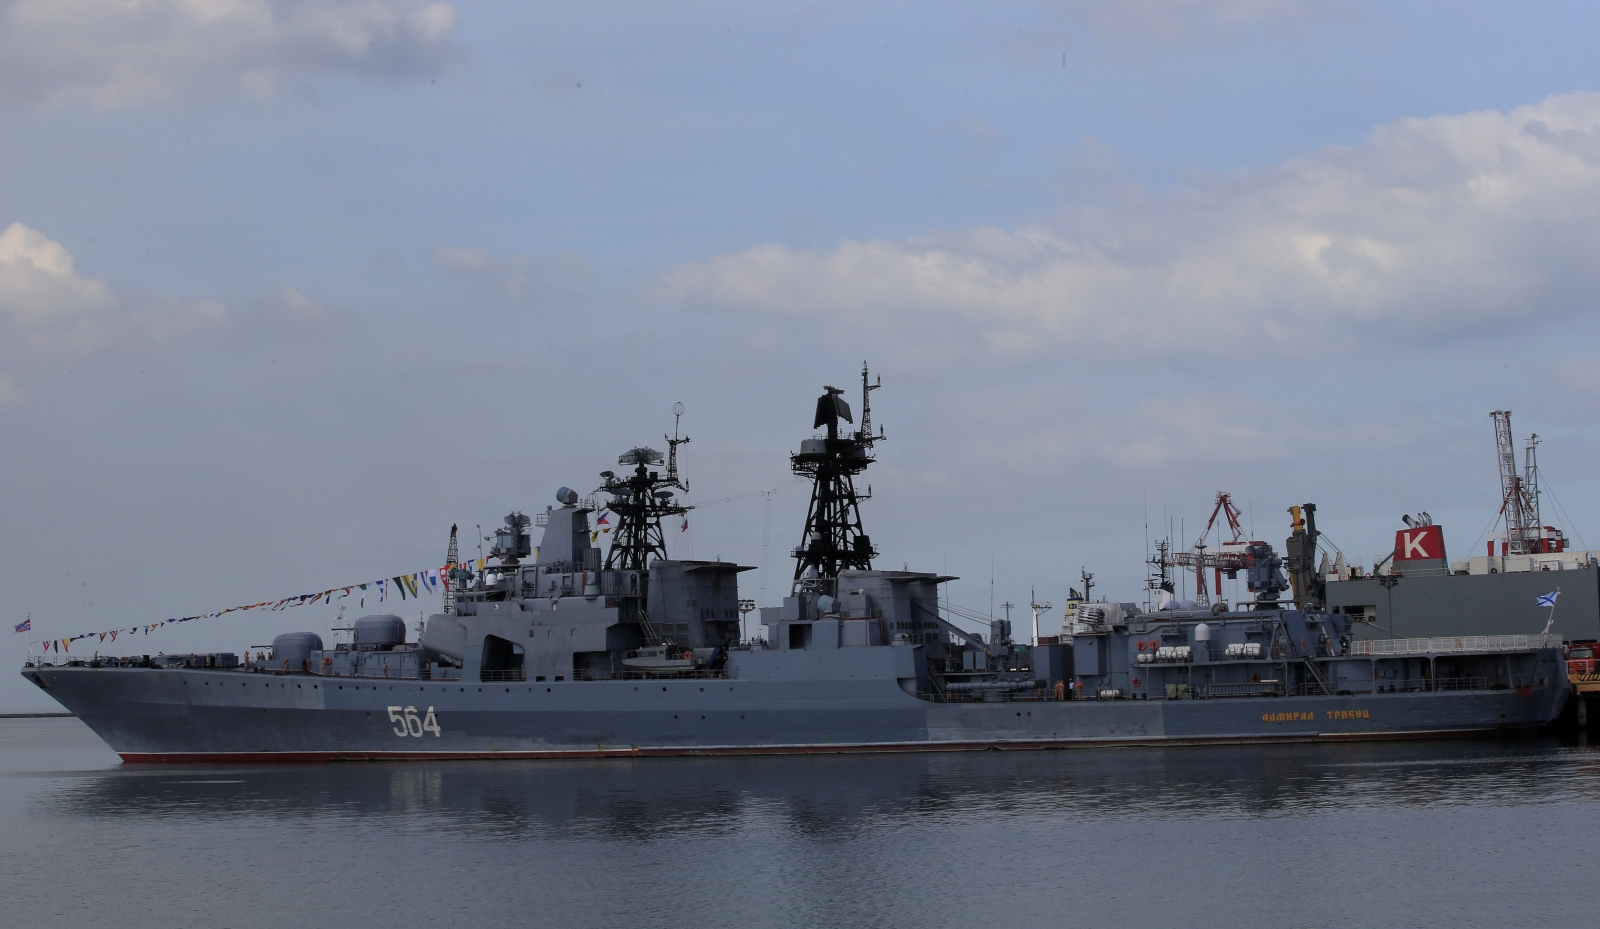 Russian navy vessel